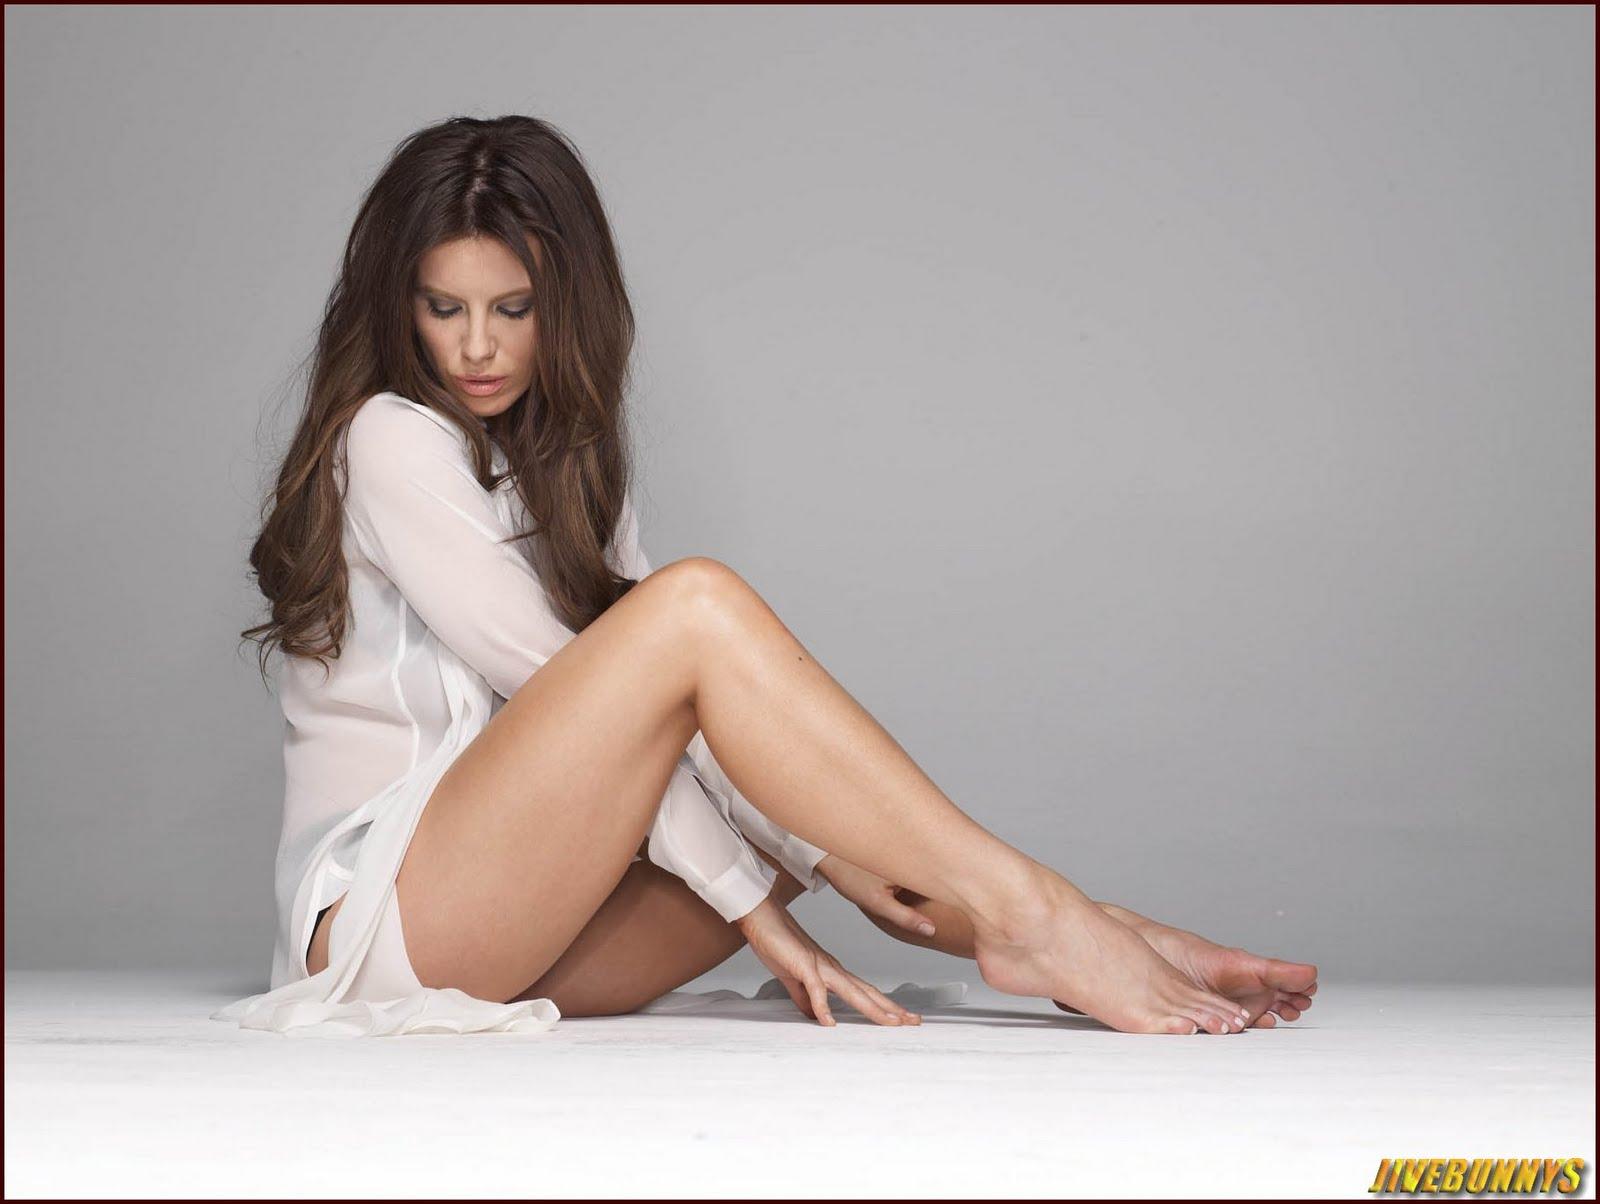 Jivebunnys Female Celebrity Picture Gallery: Kate ...